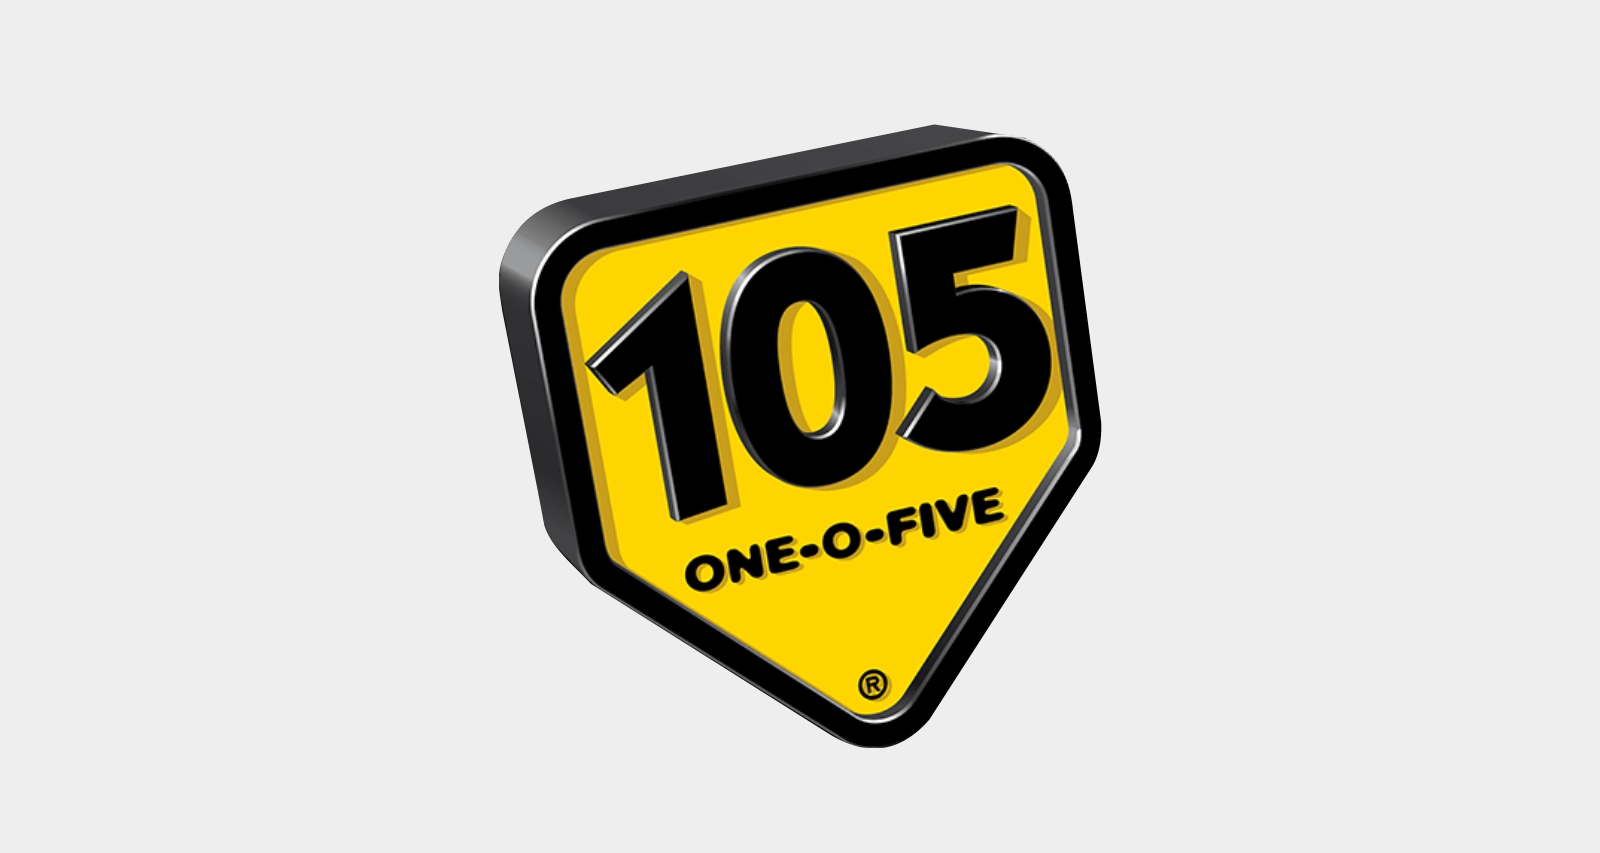 MY 105